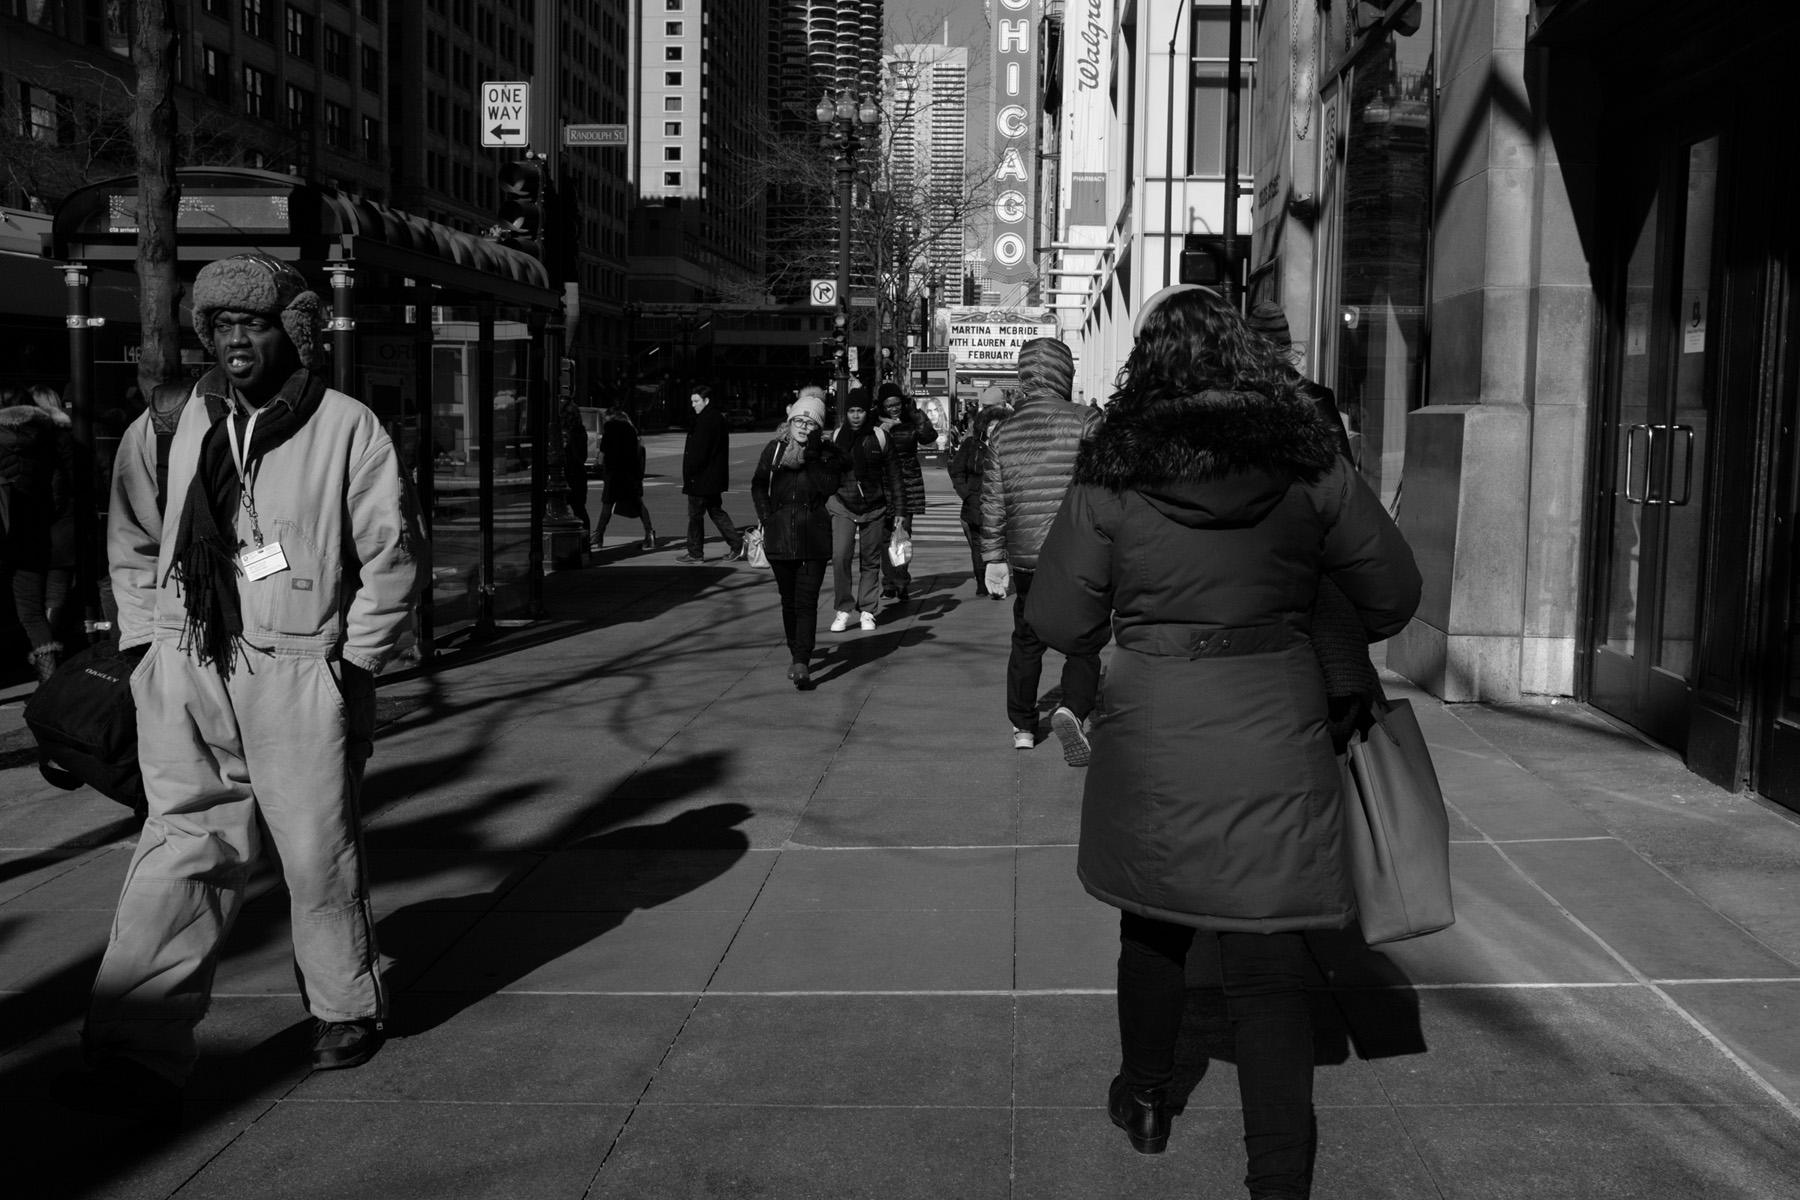 a busy side walk scene in downtown Chicago in winter.